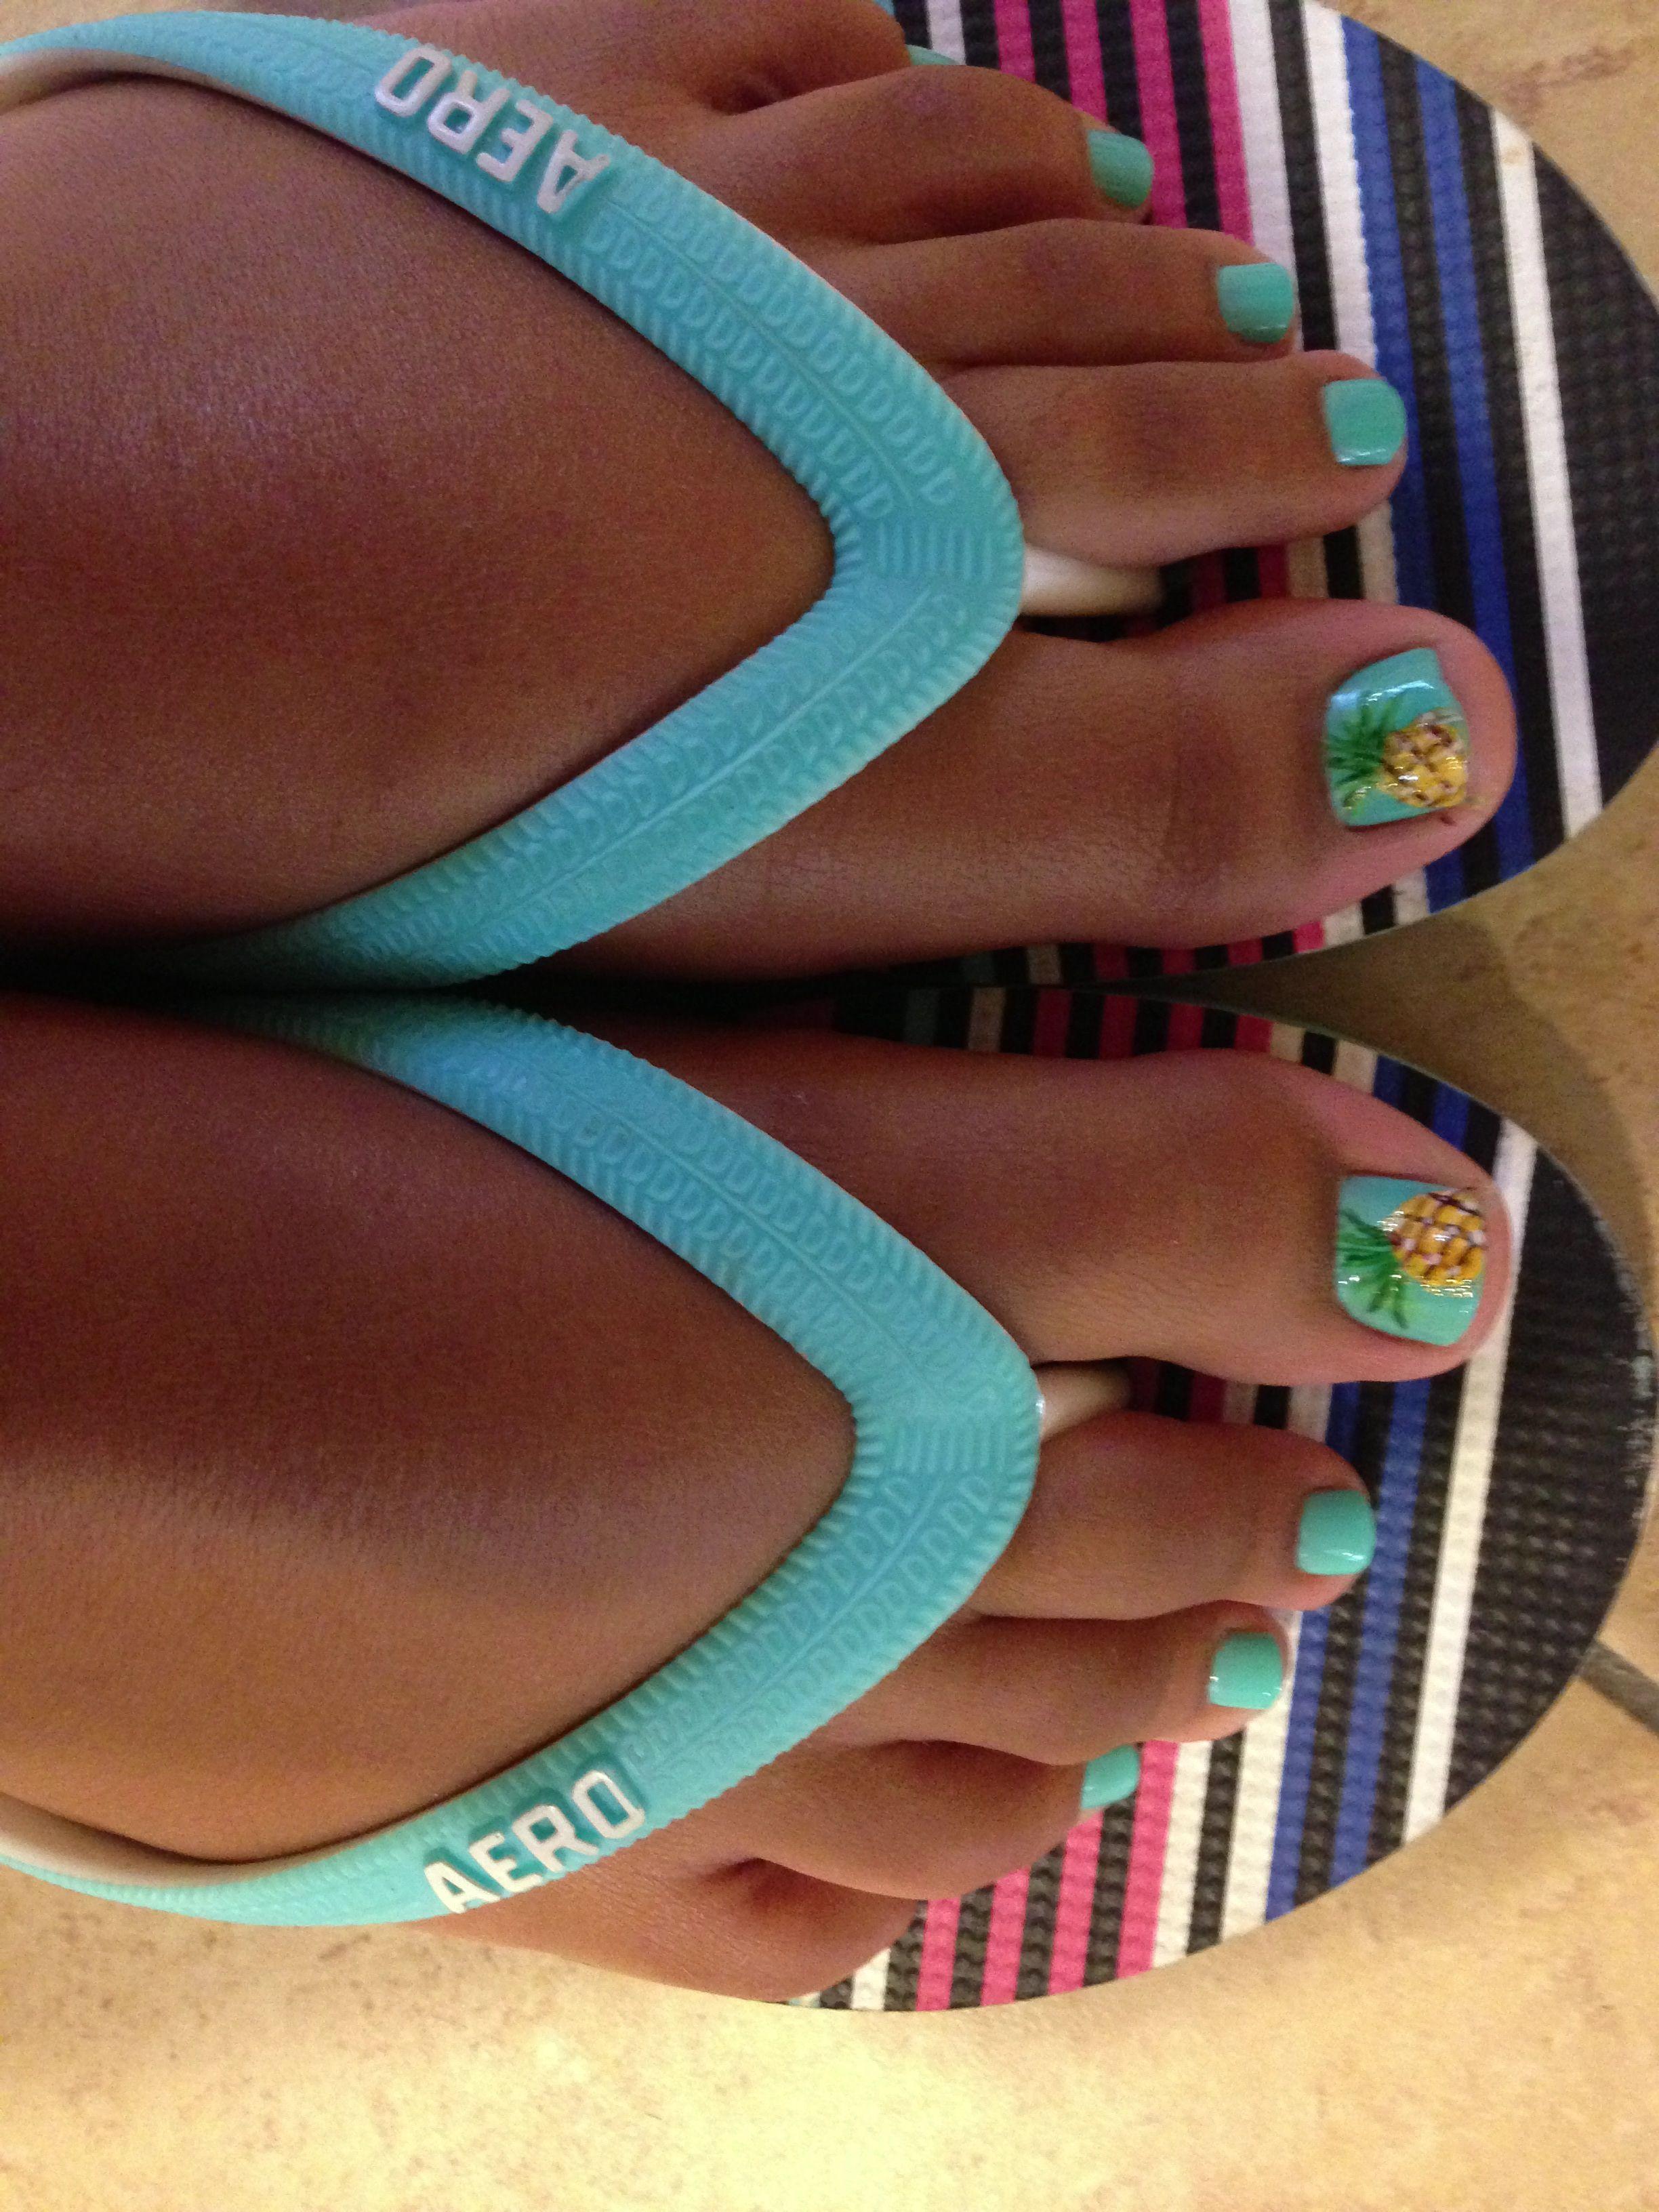 Pineapple nail art   Nail designs   Pinterest   Designs